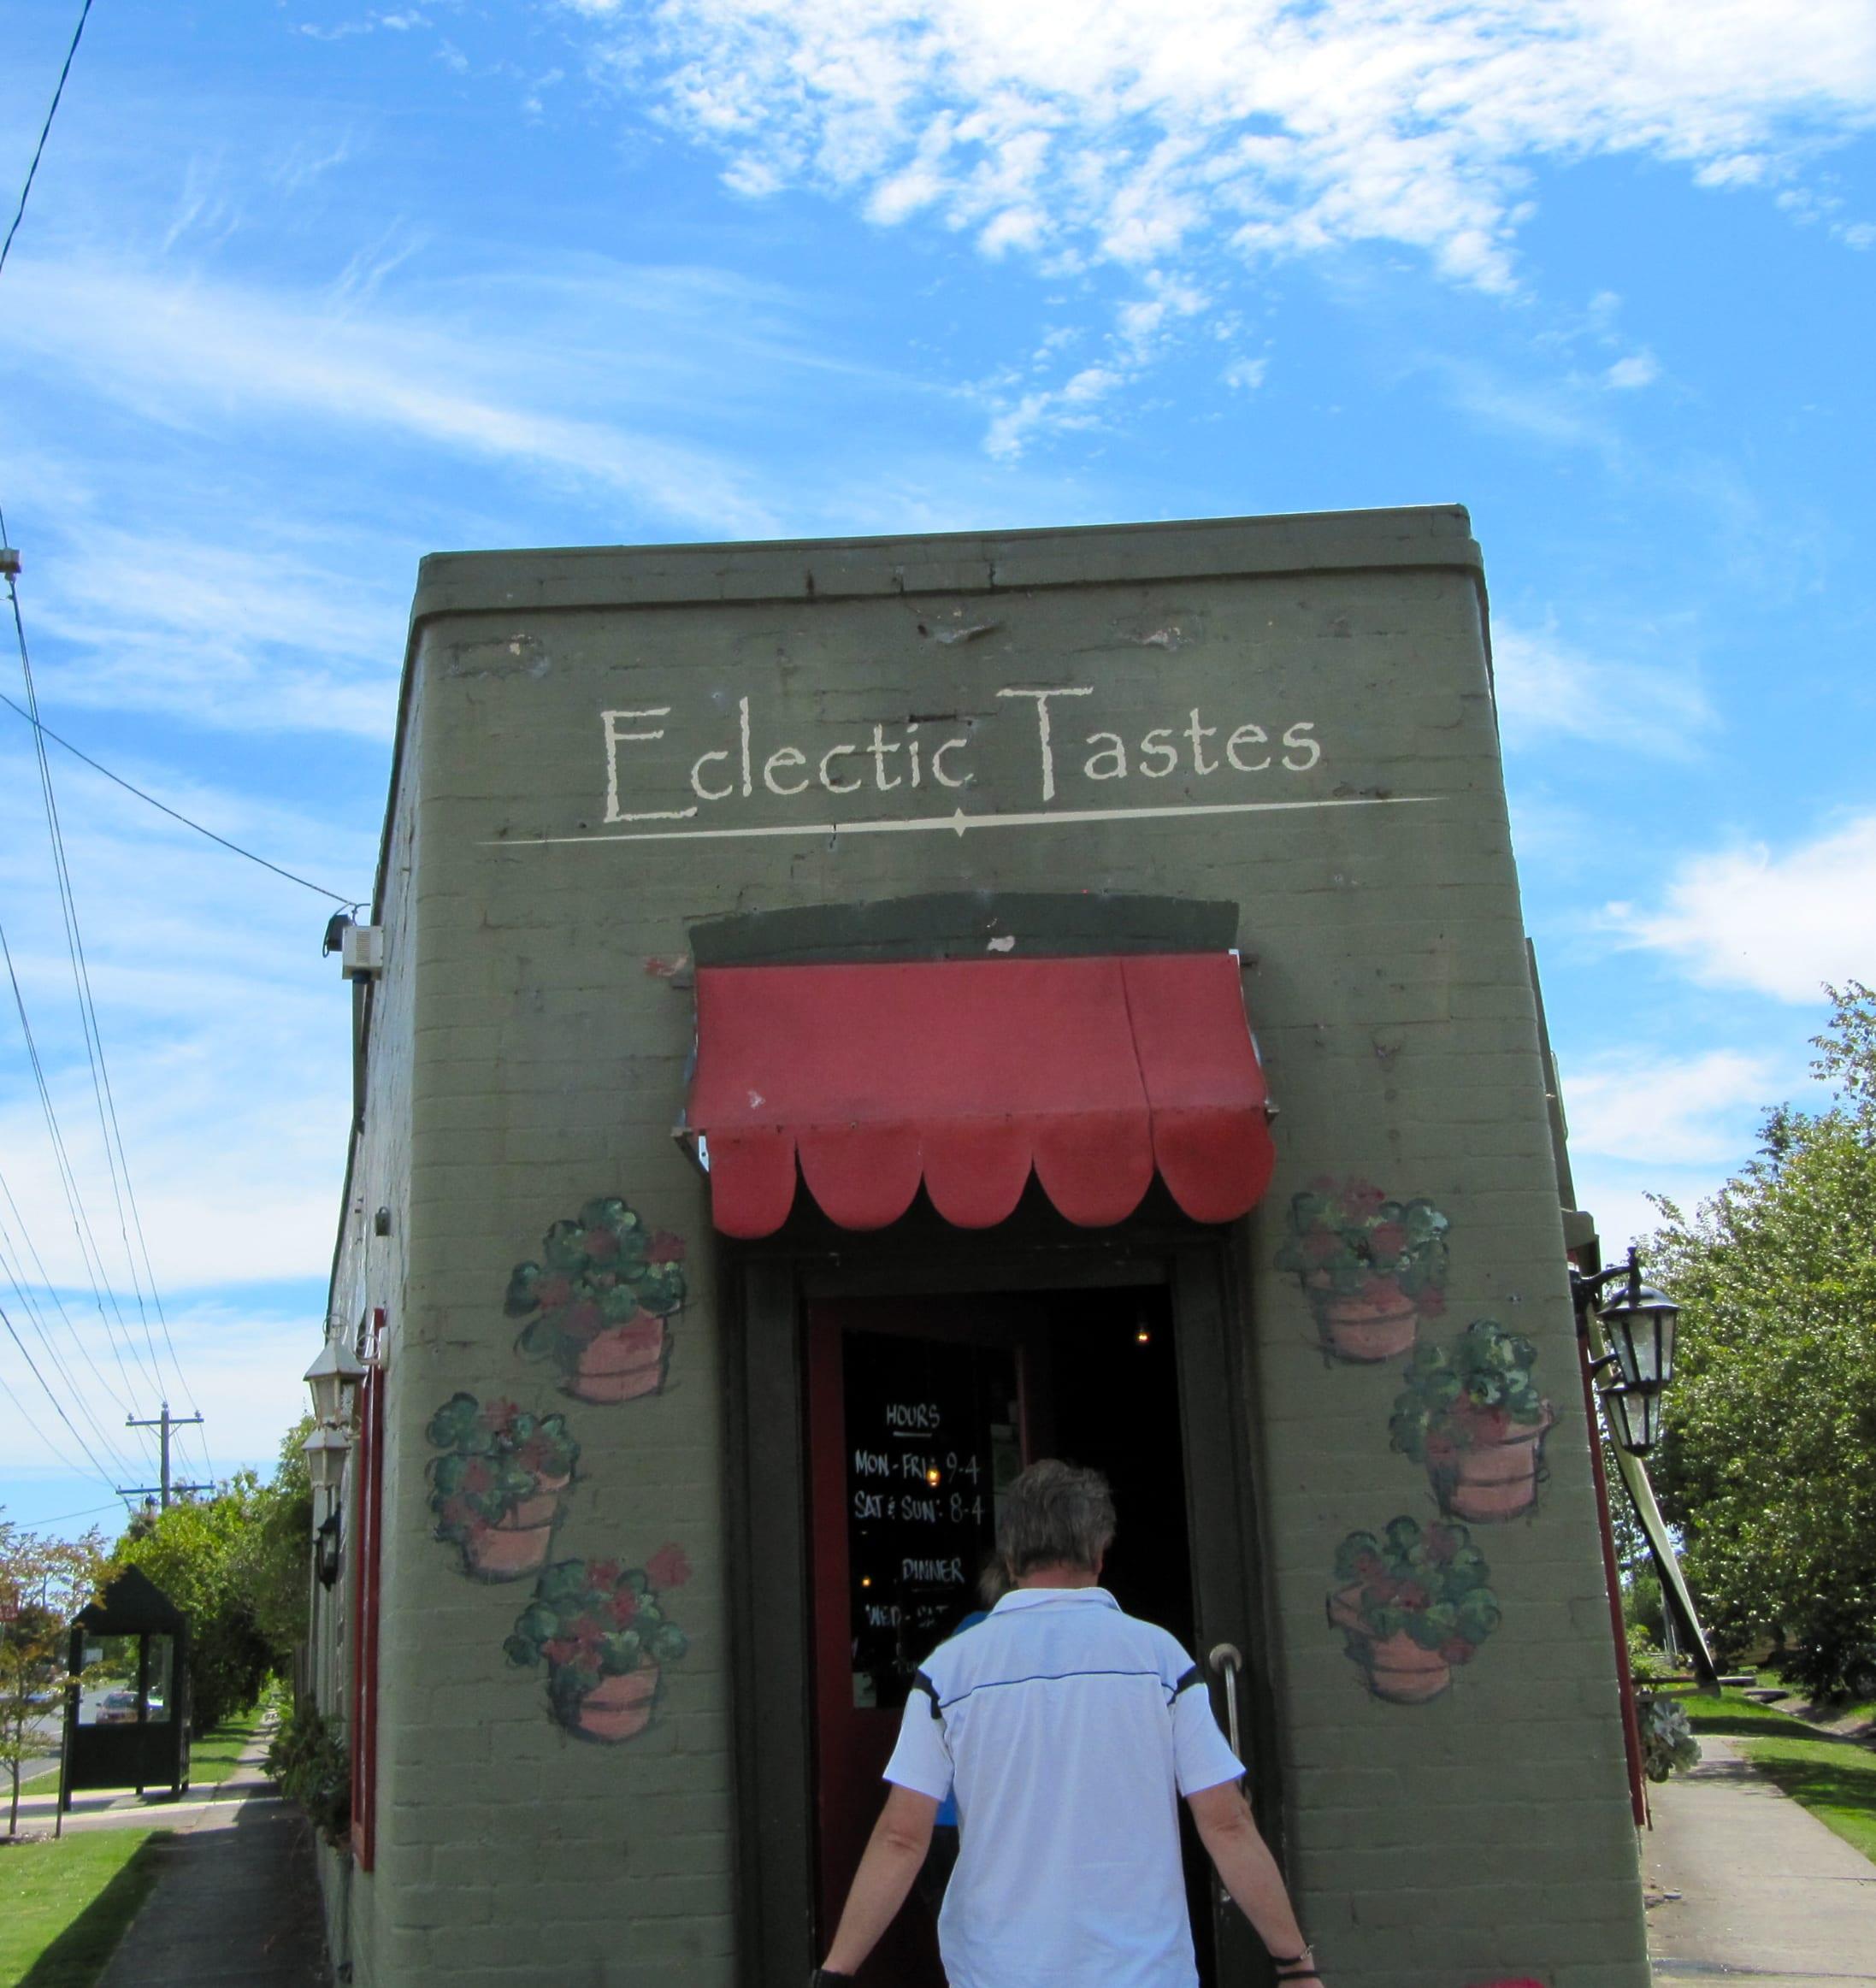 Eclectic tastes ballarat